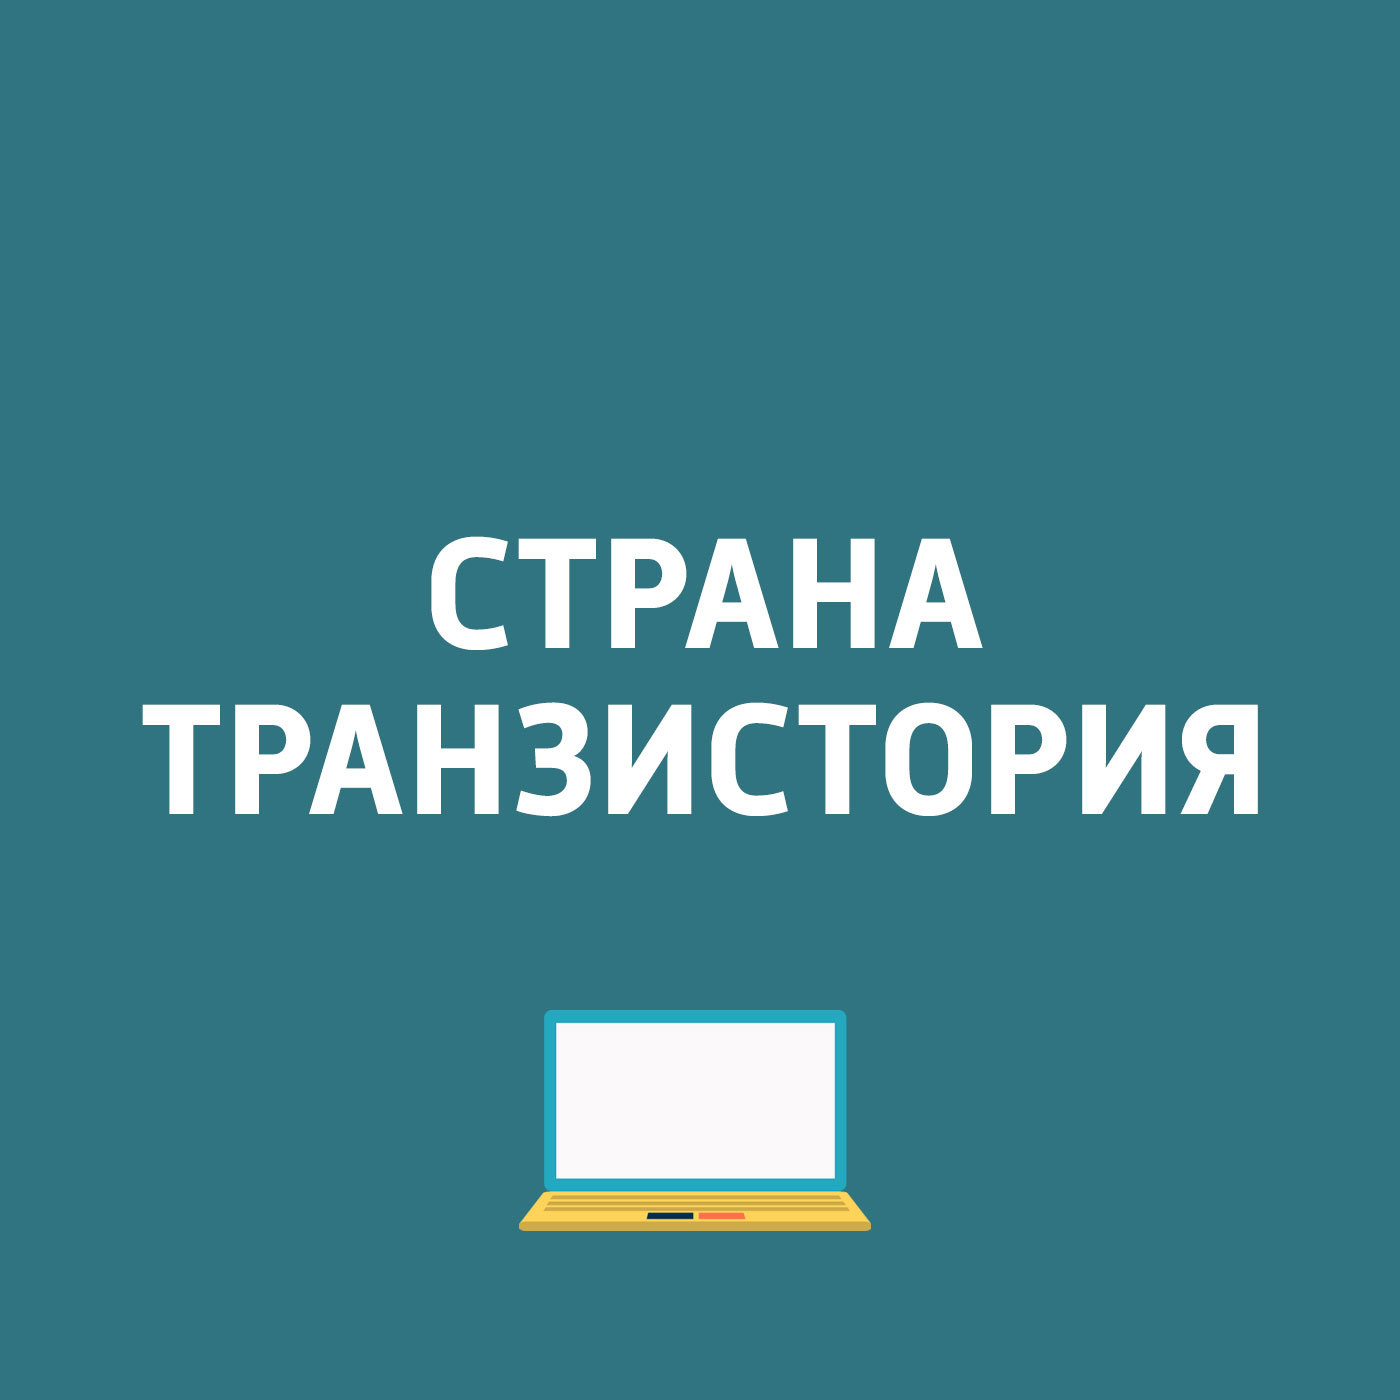 Картаев Павел Sony Xperia XZ1, Xperia XZ1 compact и Xperia XA1Plus